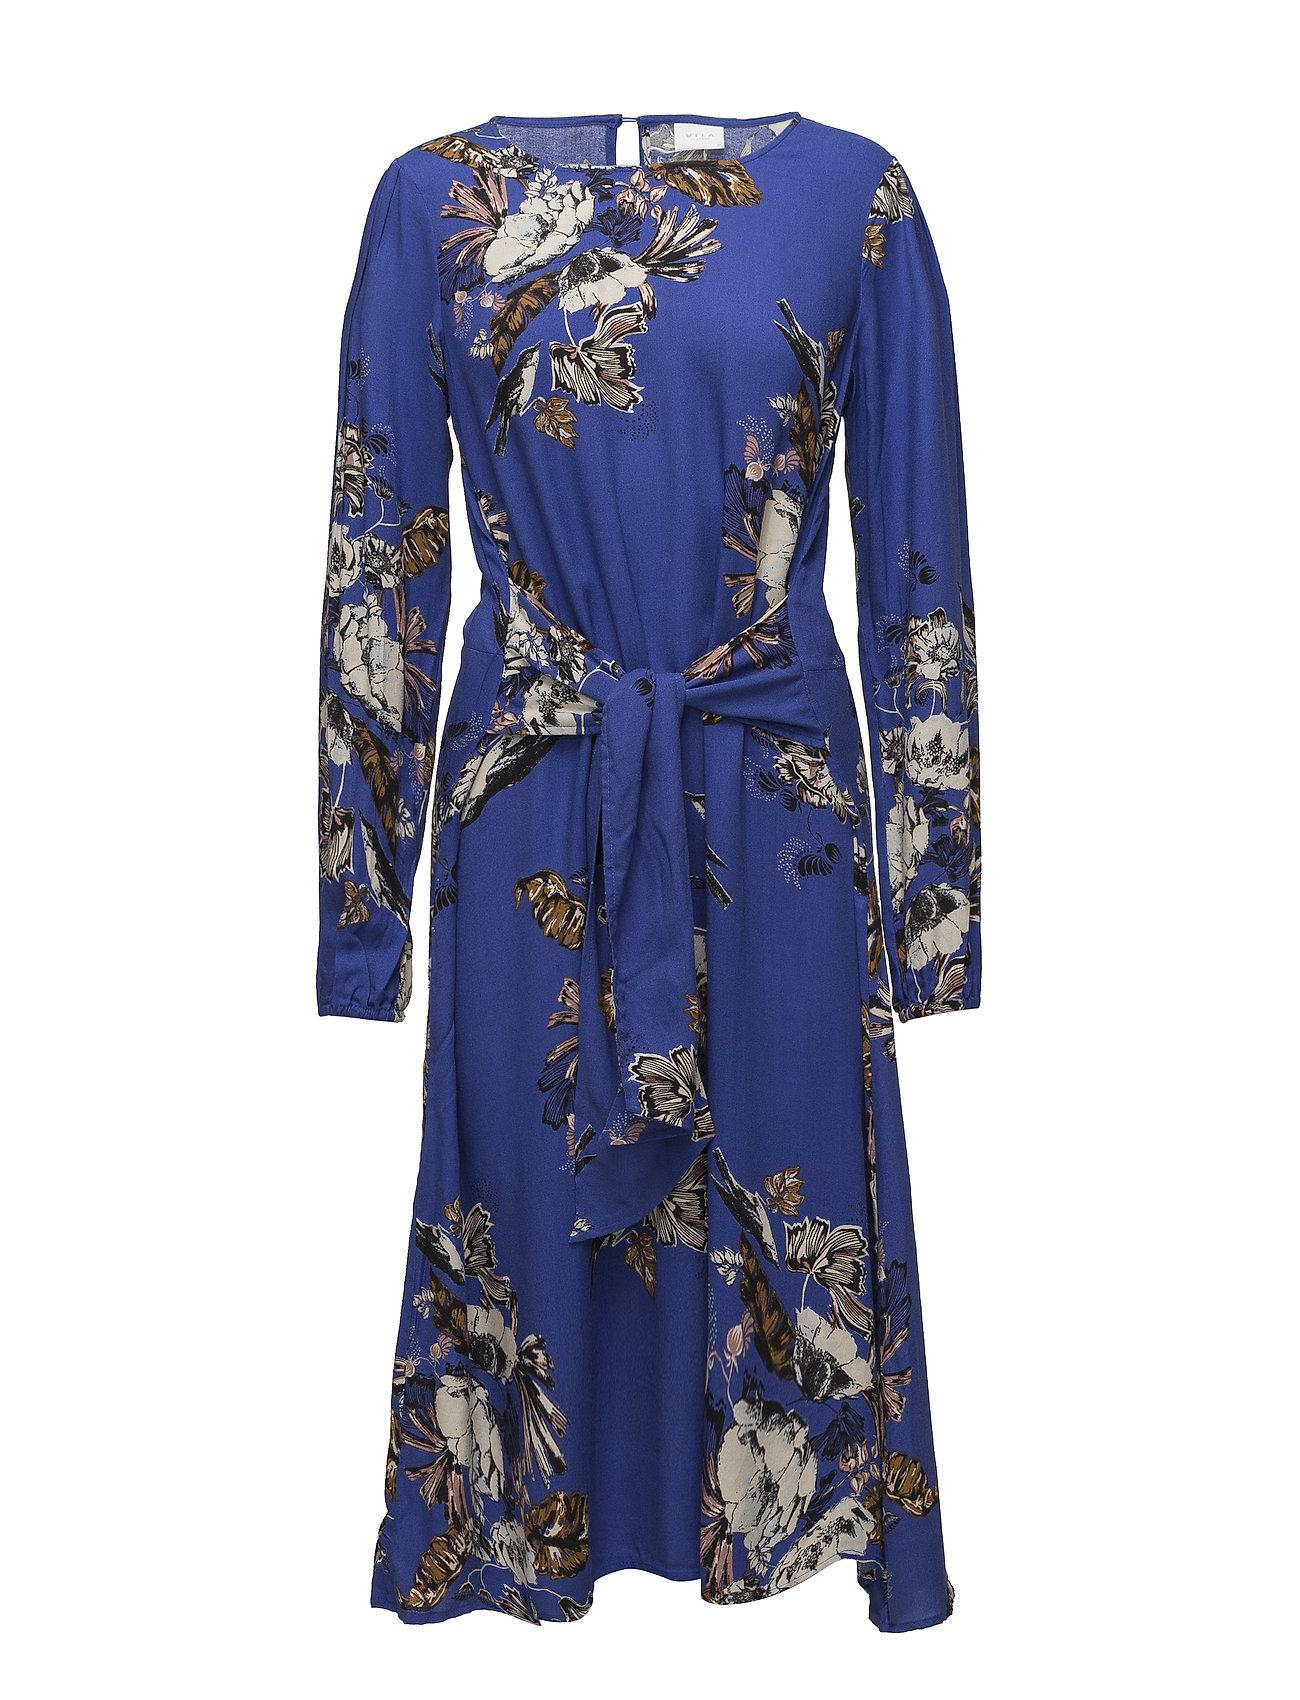 8c98b2e4833 Vila Viesto Sano L/s Midi Dress (Clematis Blue), (20 €) | Large ...